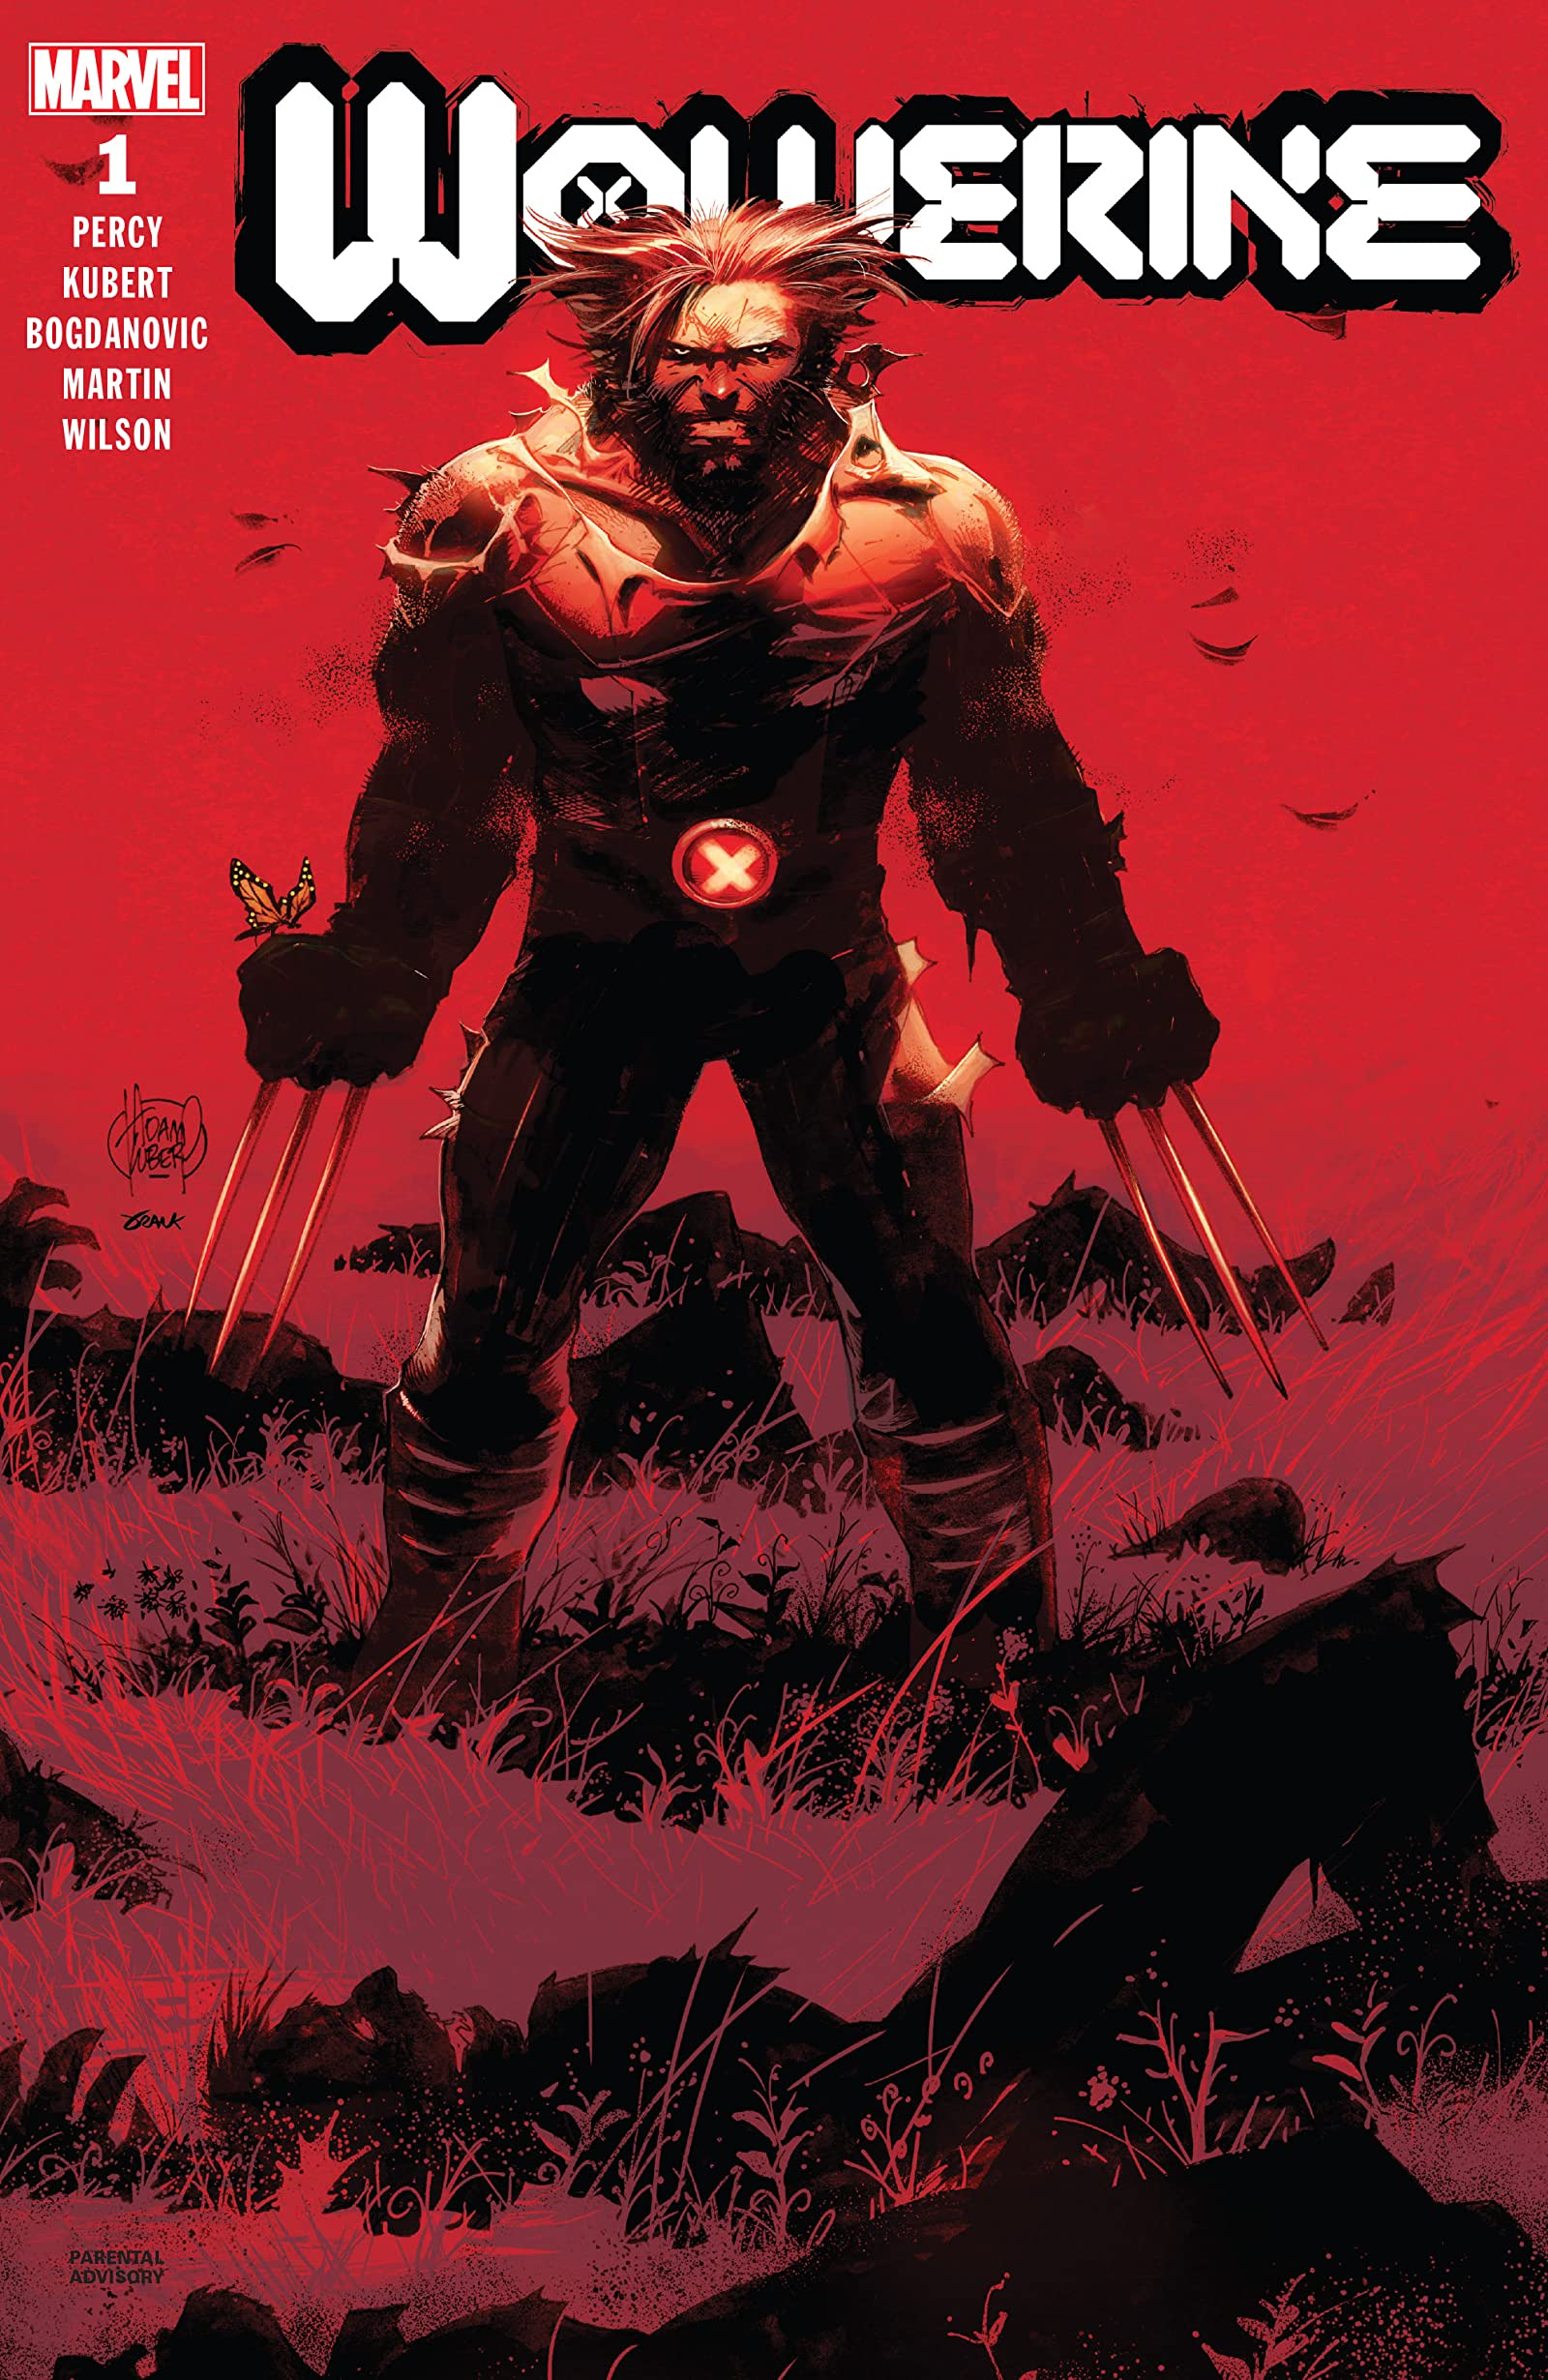 Wolverine #1-Marvel Comics(2020)